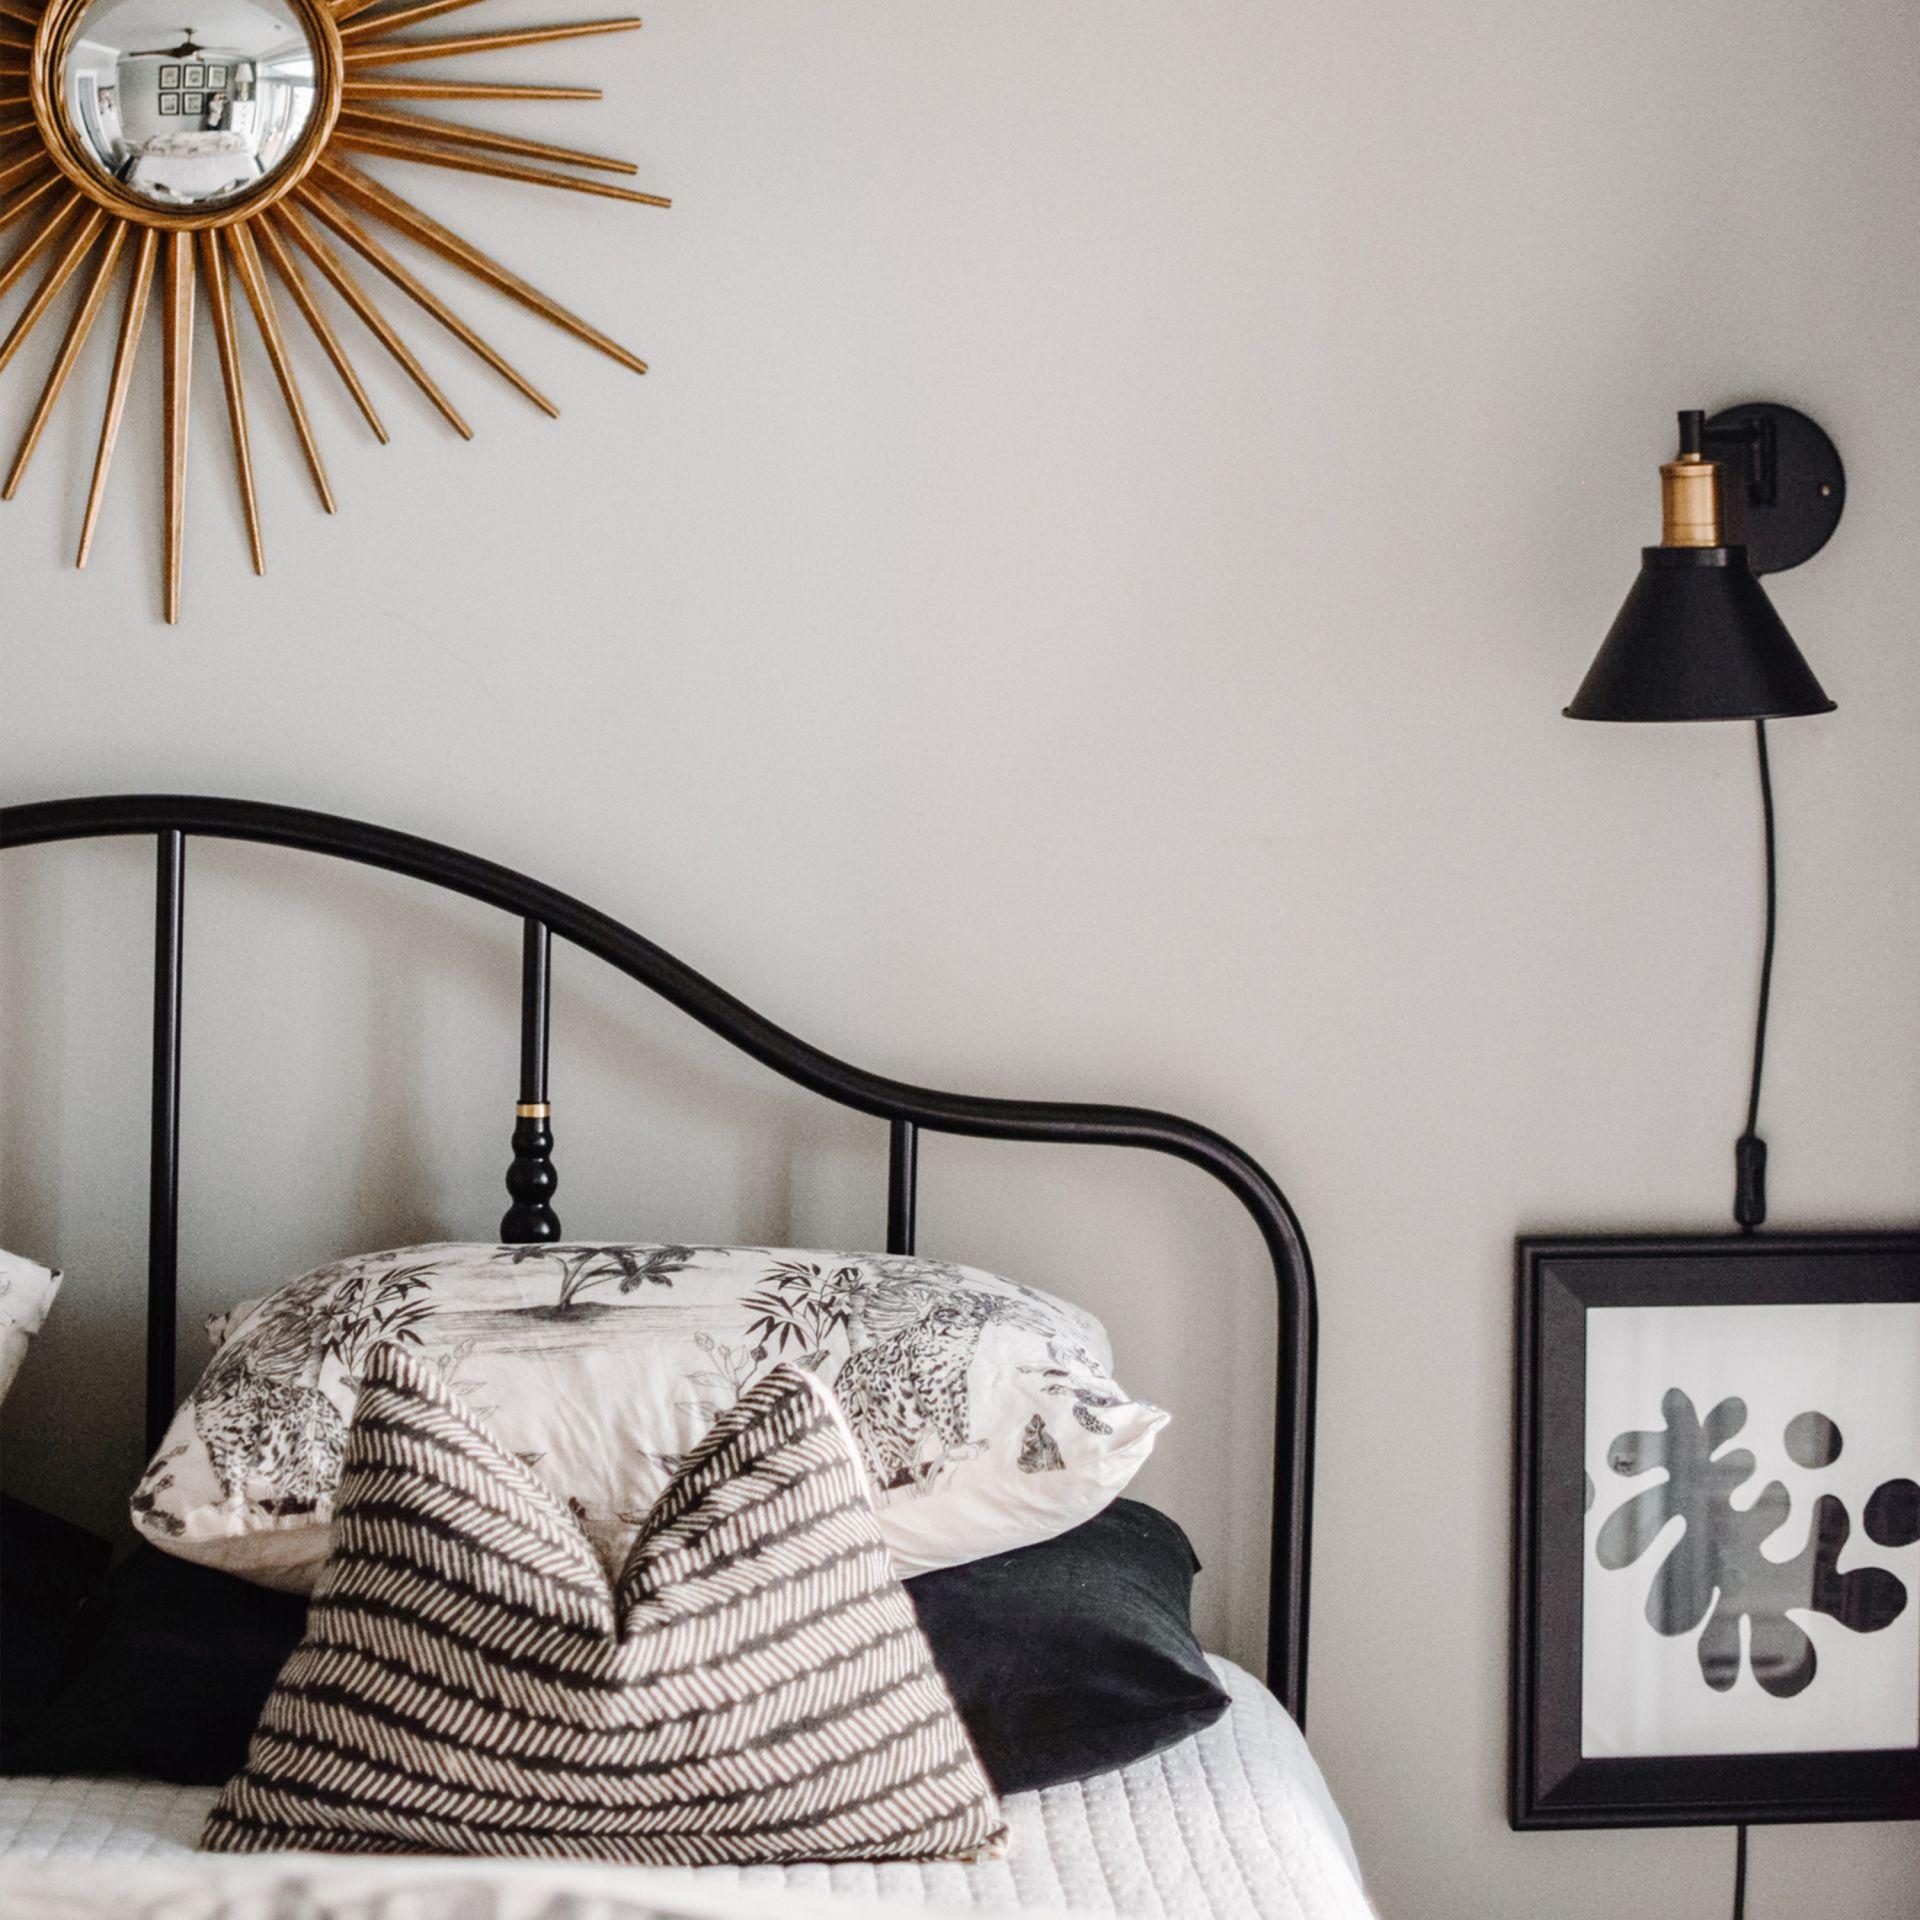 Our New Black Steel Bed Bedroom Refresh Ikea Sagstua Bed Review Heather Bien